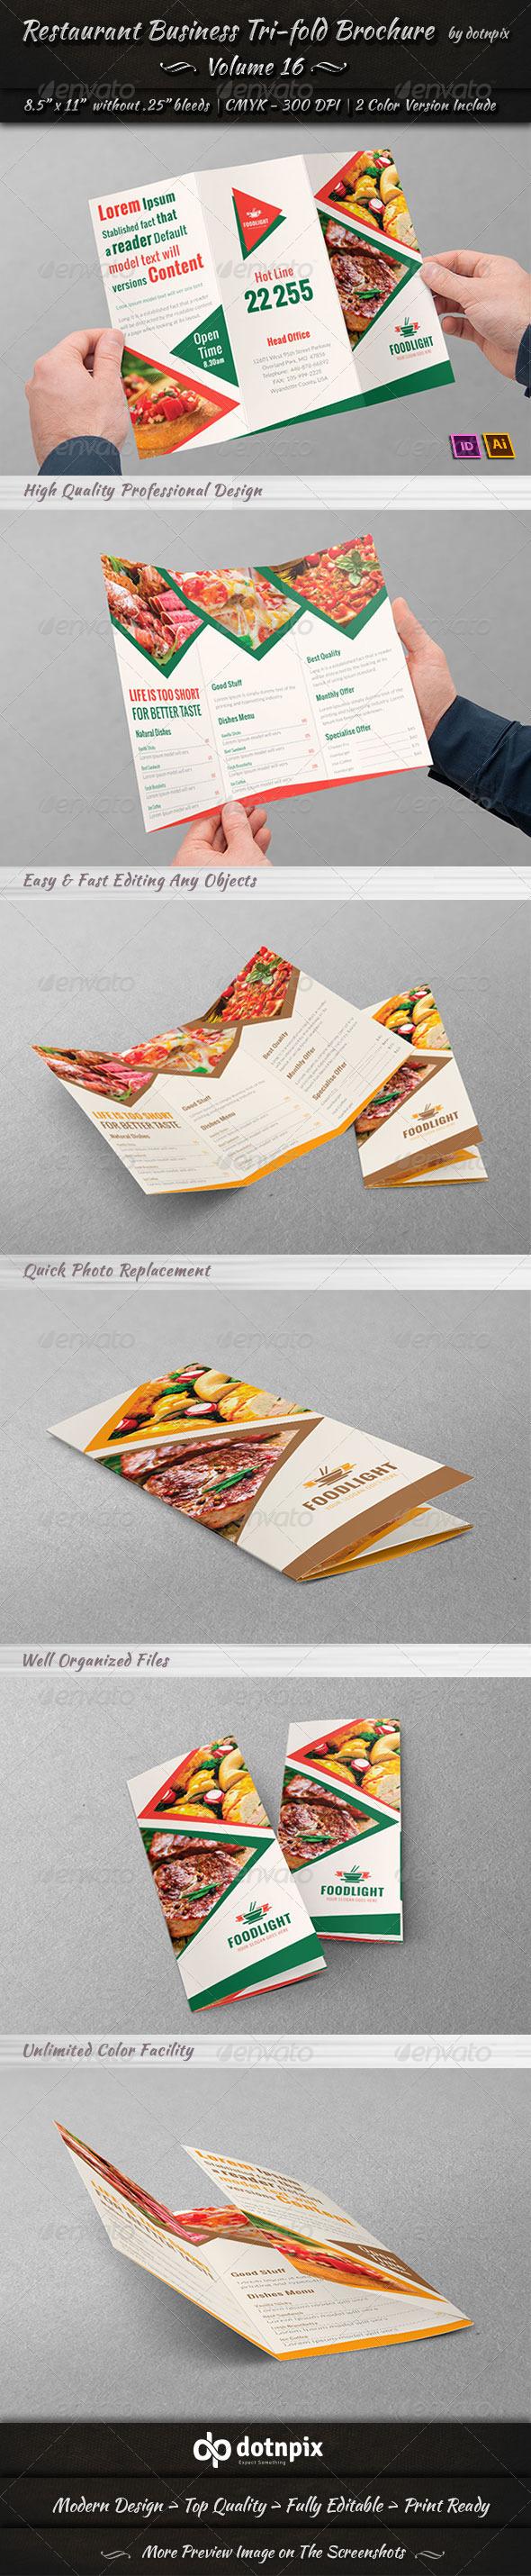 GraphicRiver Restaurant Business Tri-Fold Brochure Volume 16 8047766